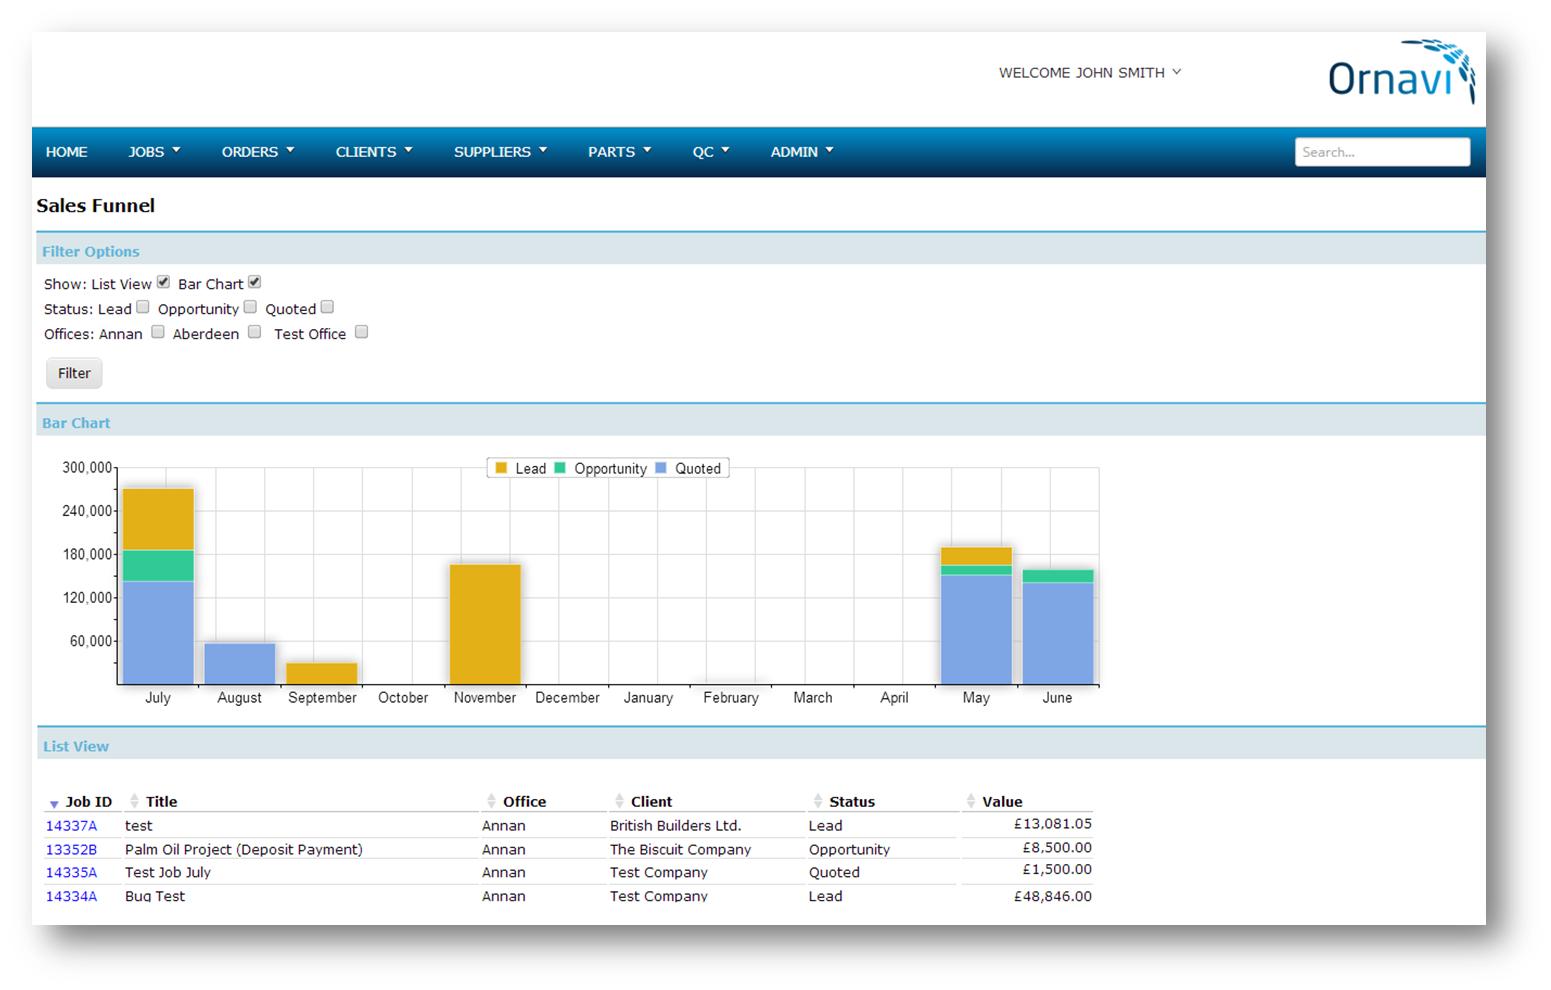 Ornavi Screenshot - Sales Funnel Report